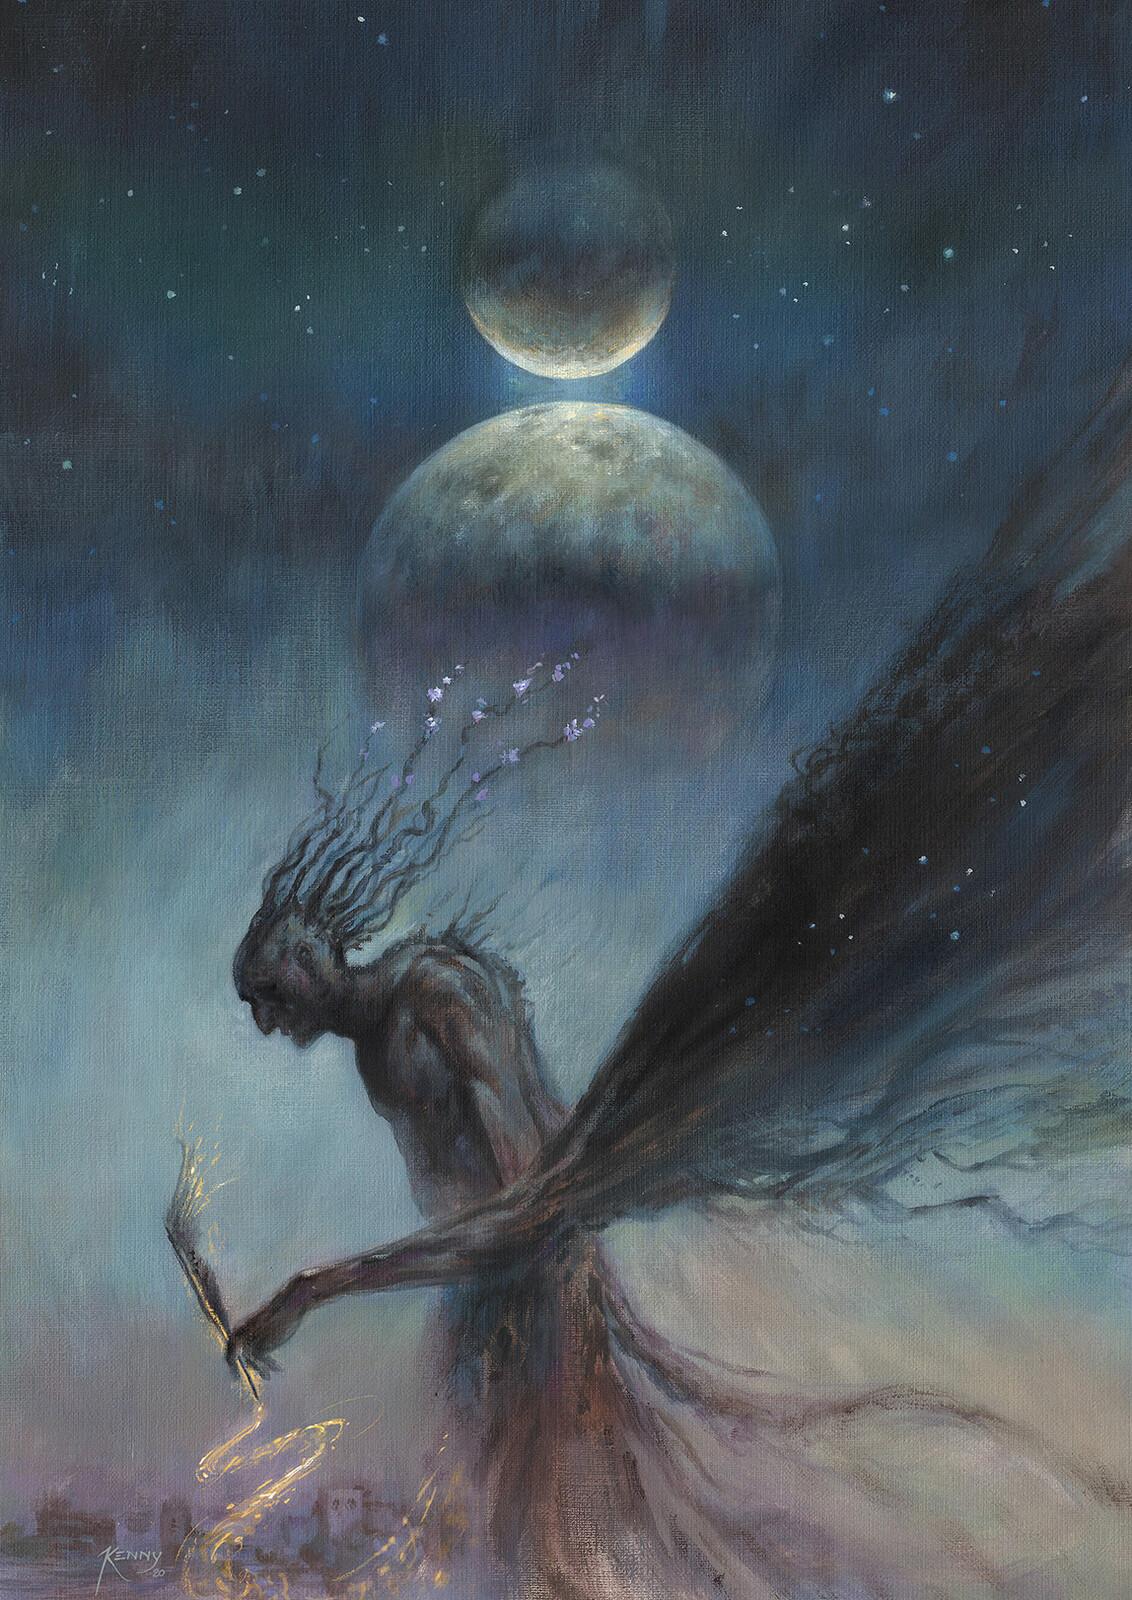 The moons of Lirba